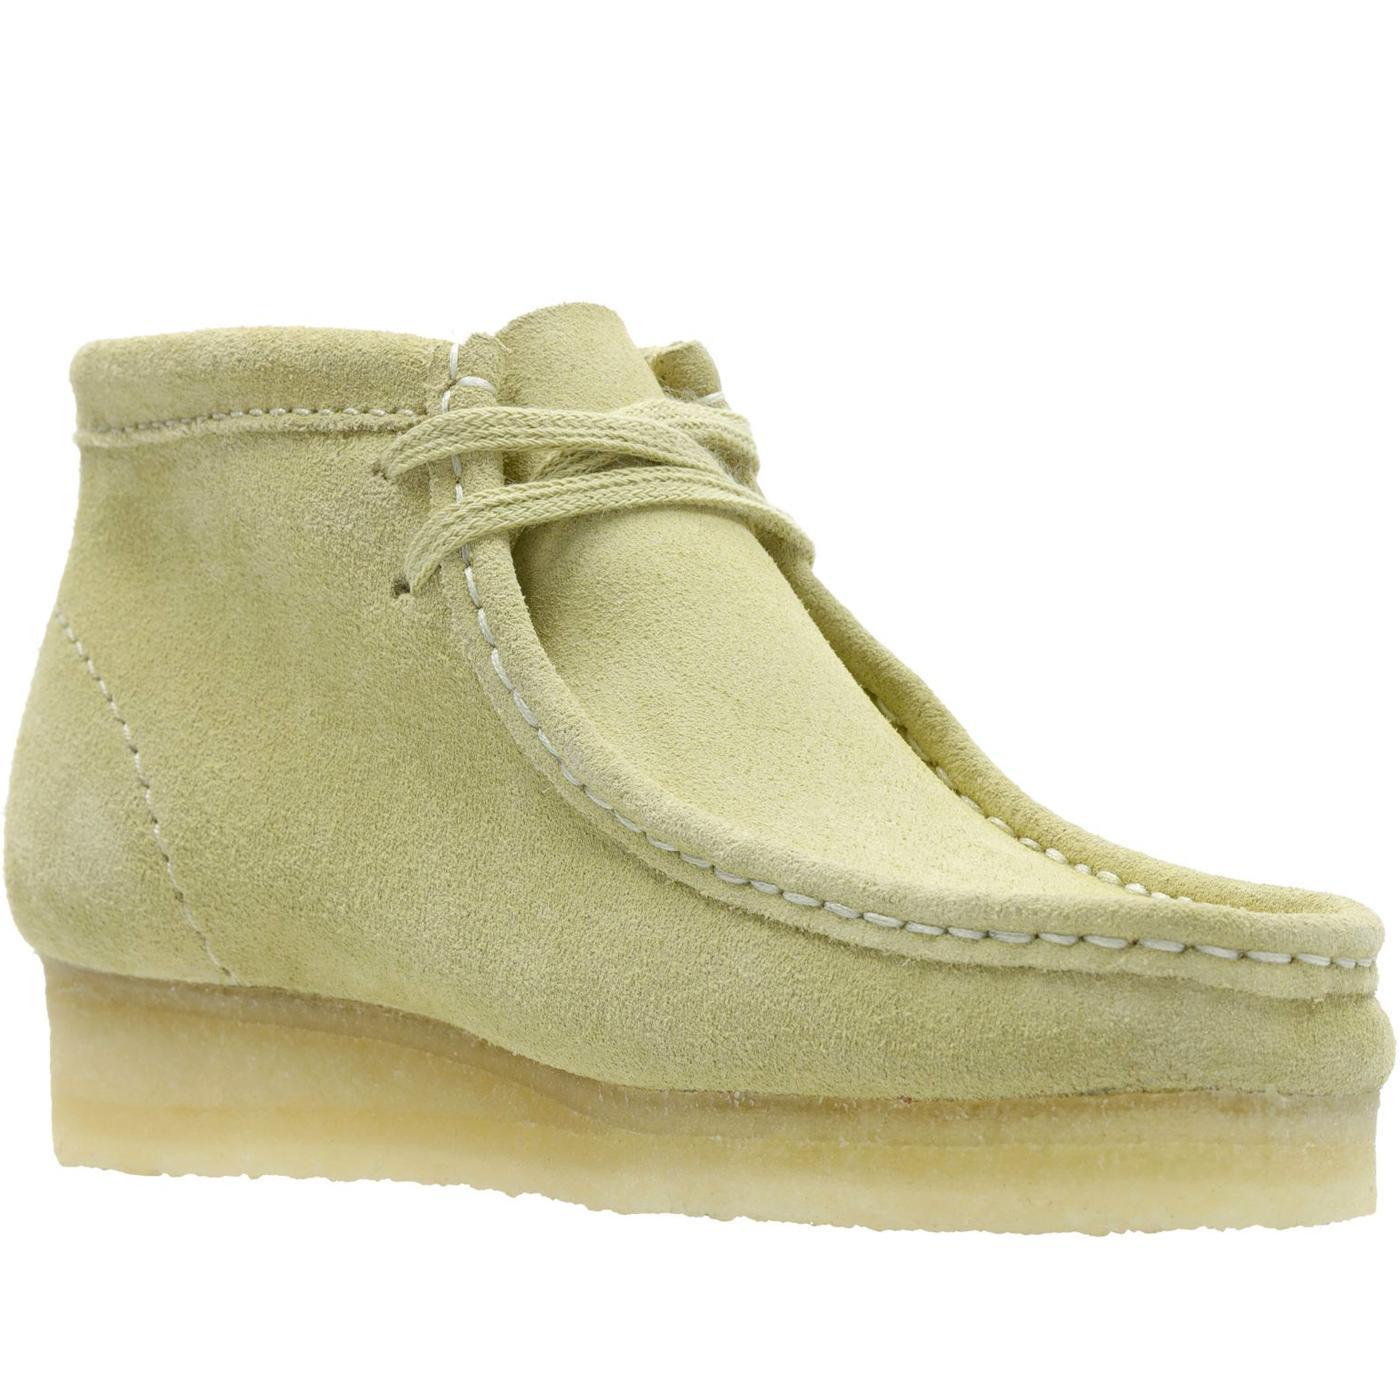 Wallabee Boot CLARKS ORIGINALS Maple Suede Boots